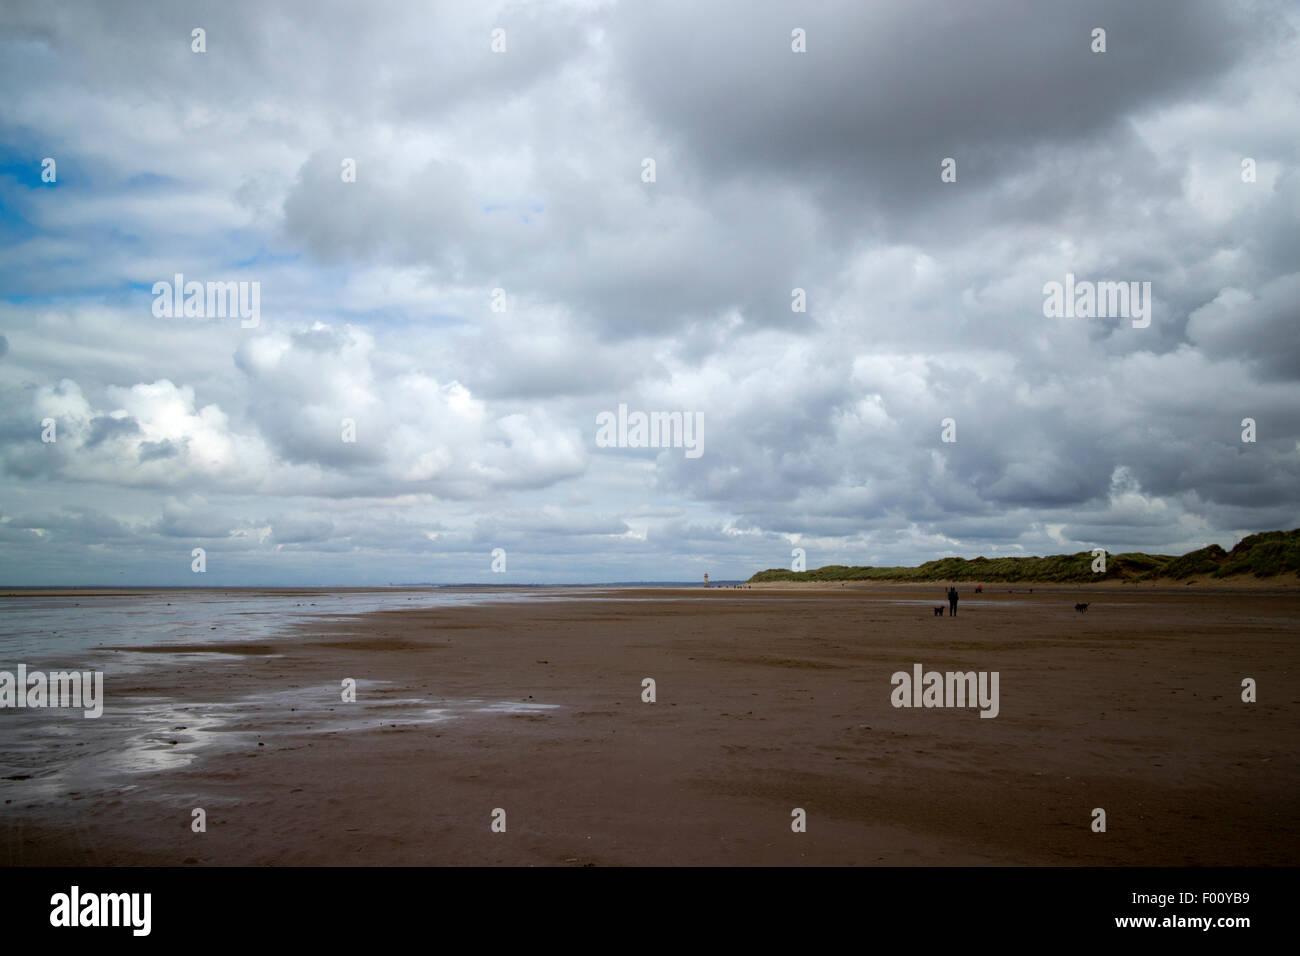 warren beach near Talacre beach sssi north wales uk - Stock Image